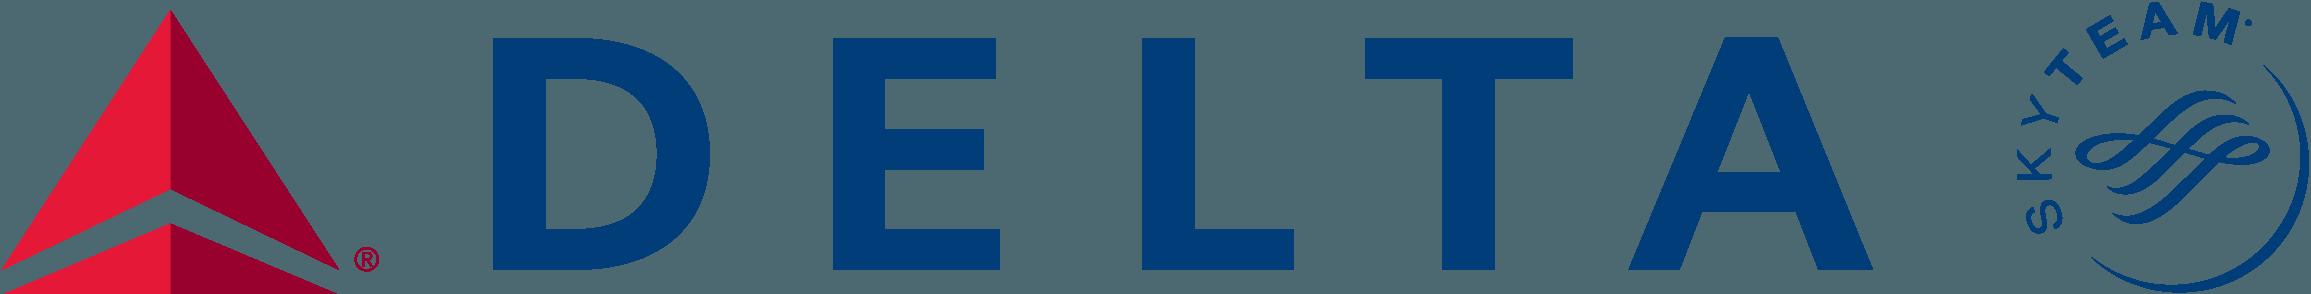 Delta Airlines Logo png